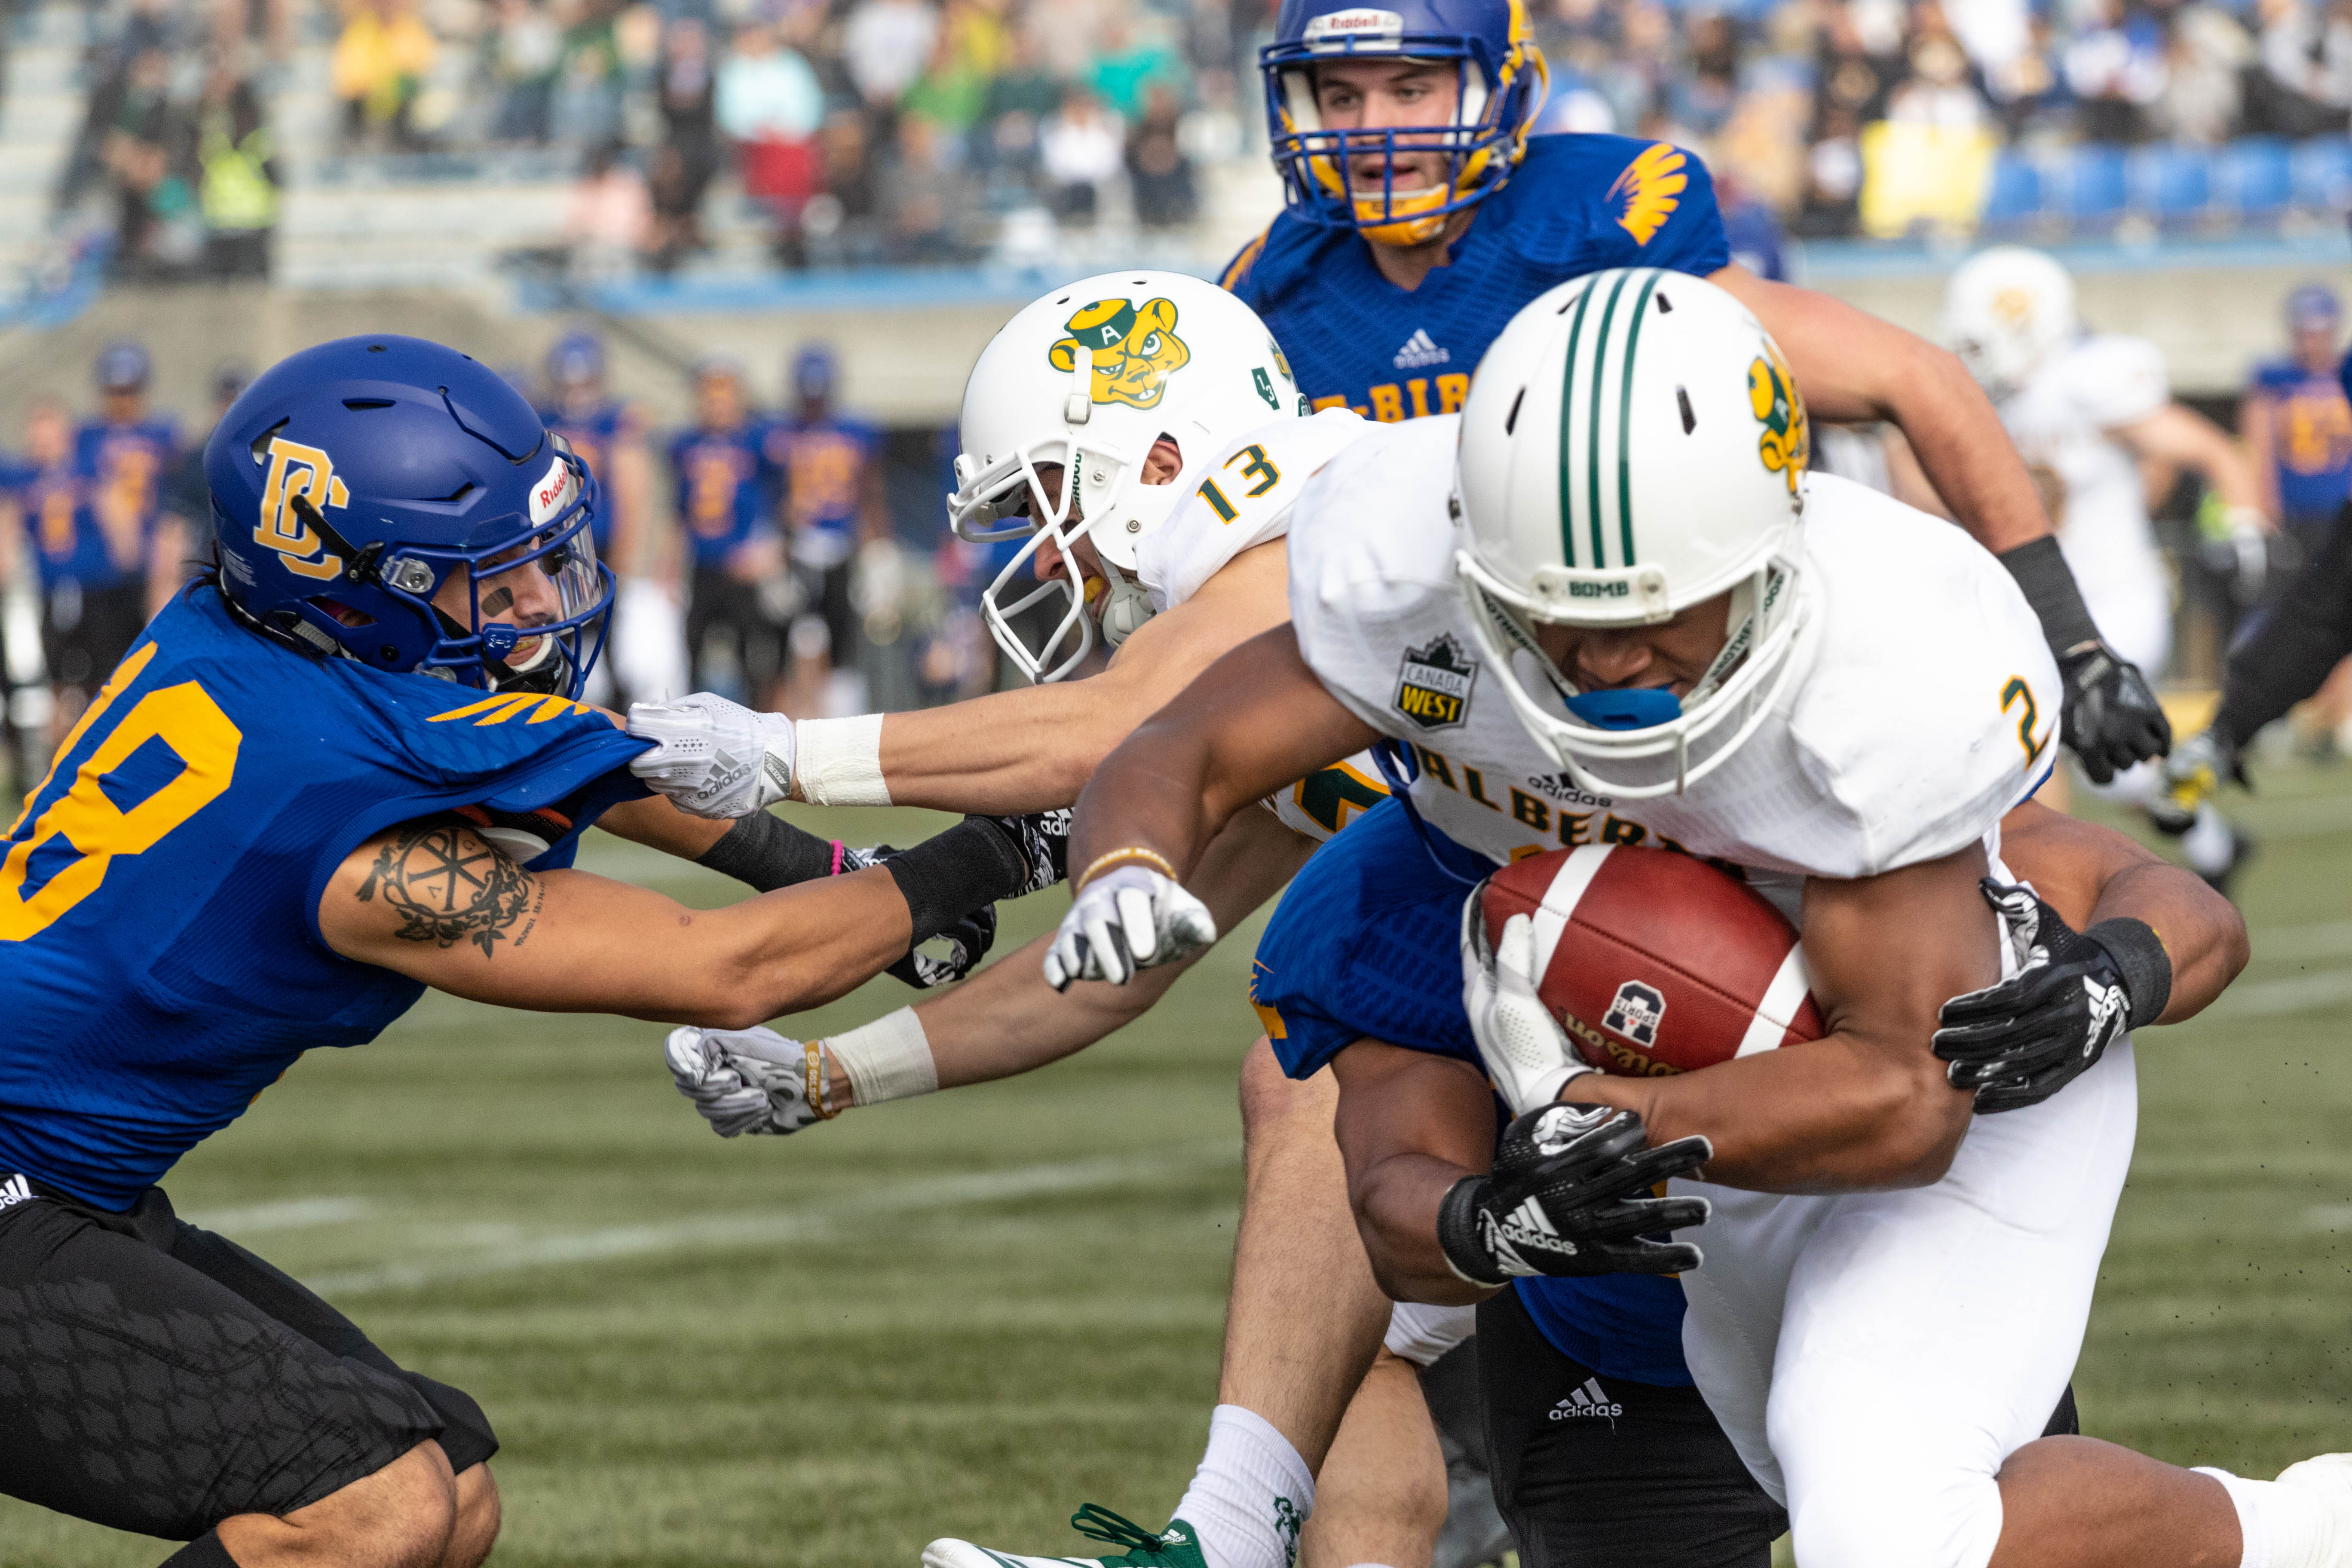 Katsantonis battles with the Alberta Golden Bears back in 2018.